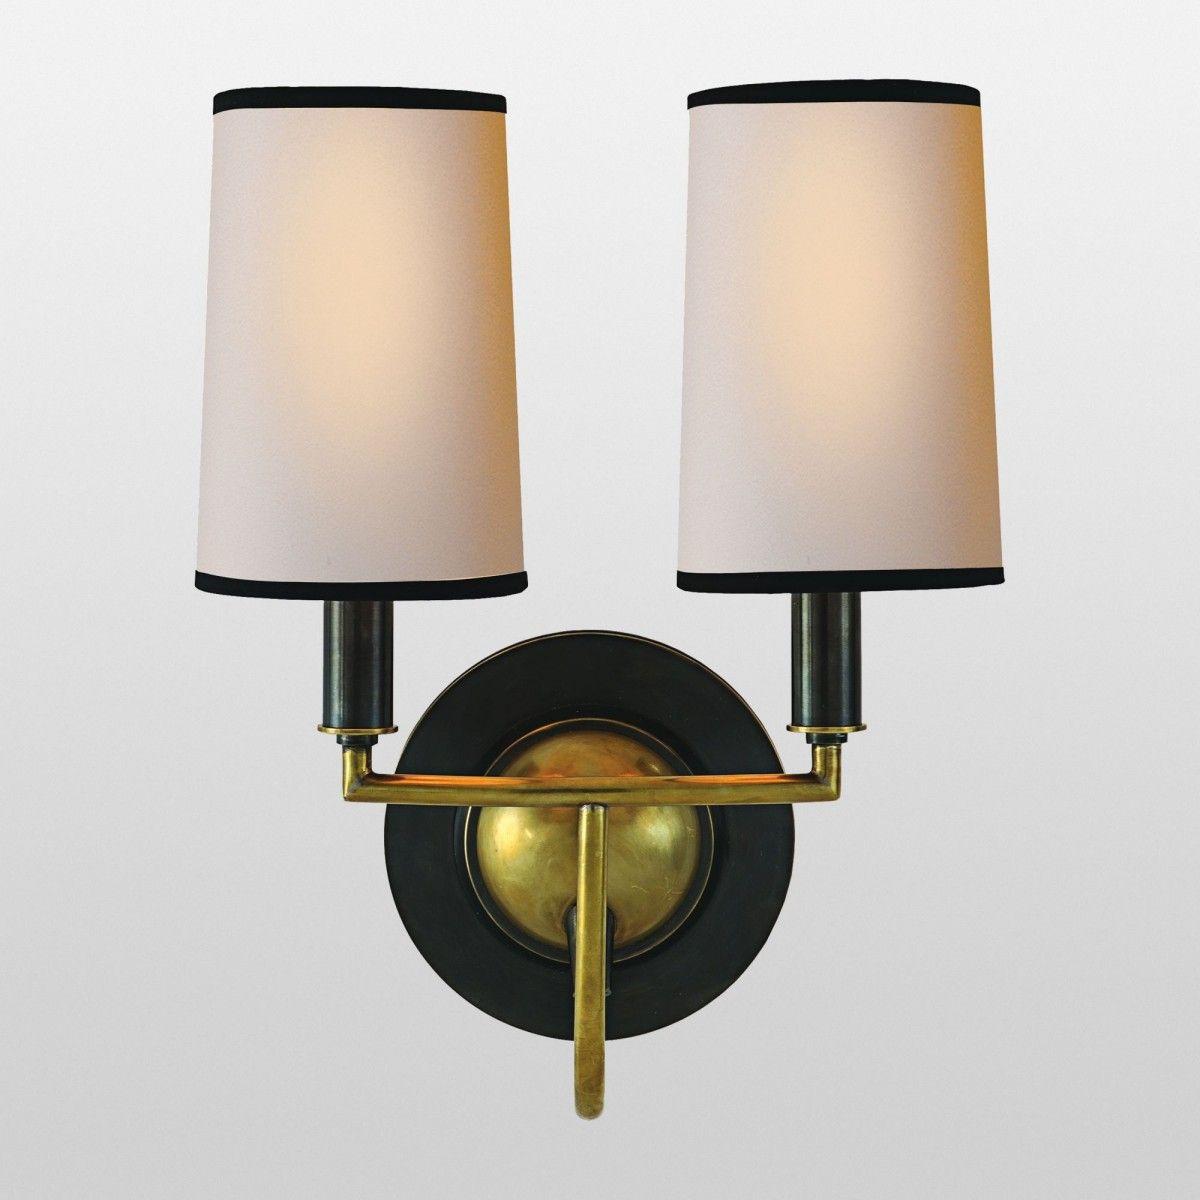 Elkins Sconce Double Wall Lights Visual Comfort Lighting Visual Comfort